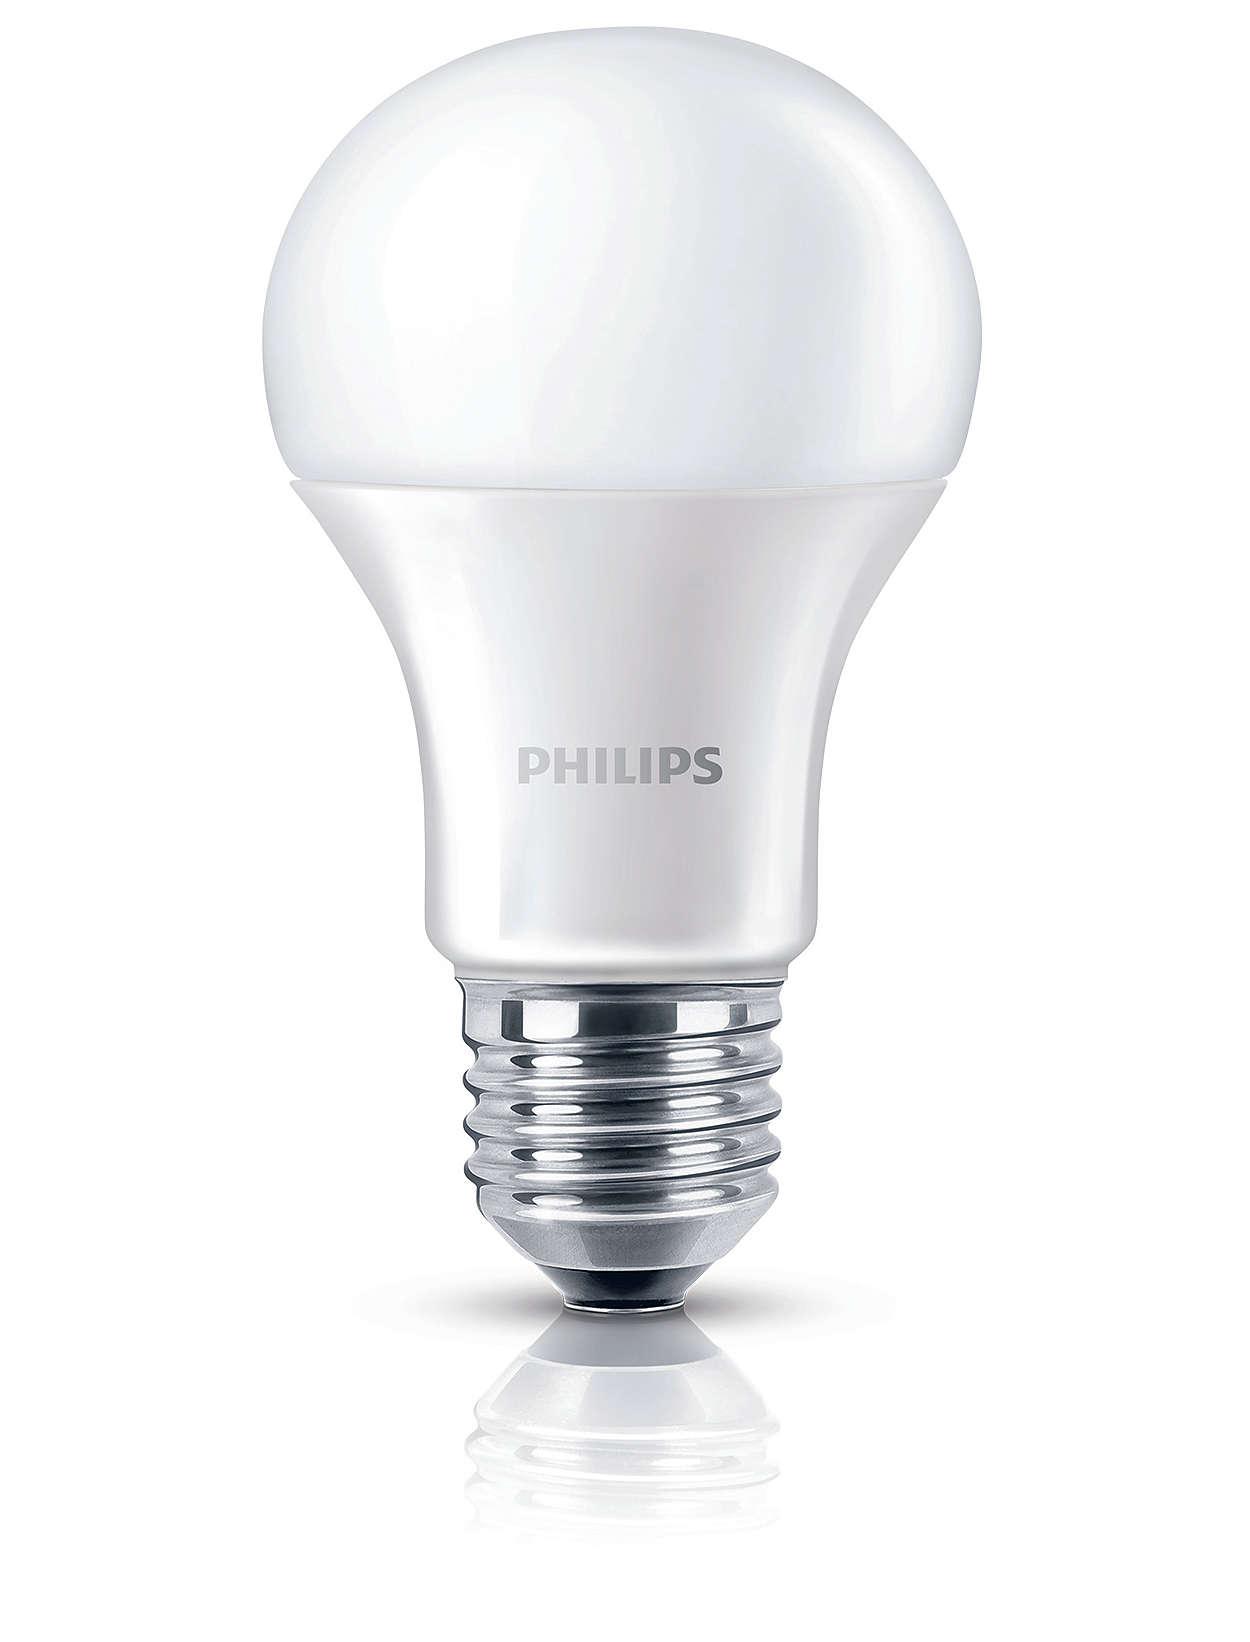 Luce bianca calda senza compromessi sulla qualità